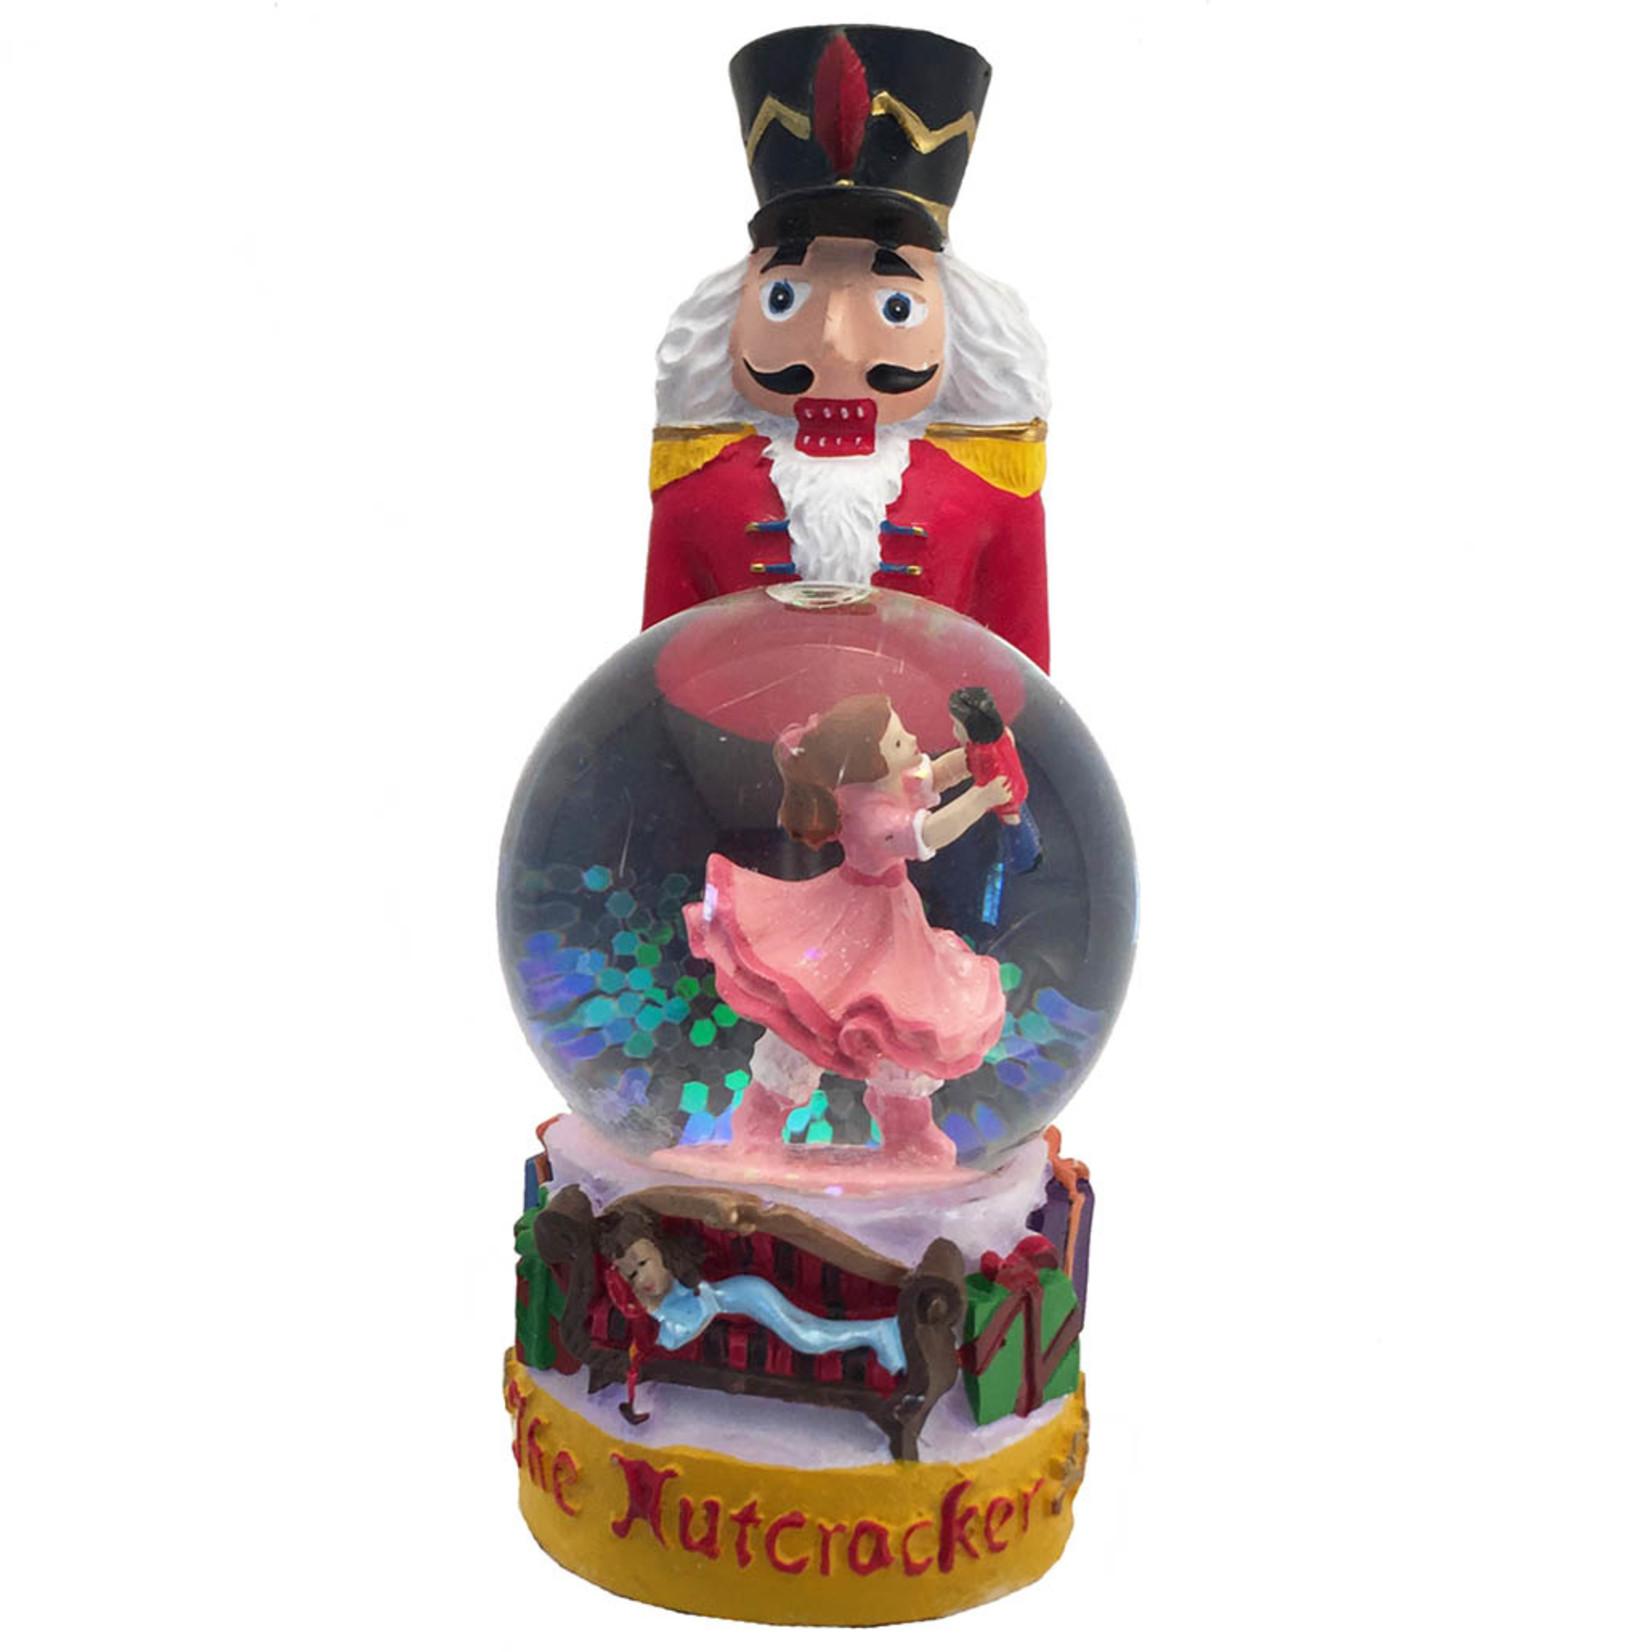 Nutcracker Ballet Gifts Nutcracker Figurine With Clara Mini Snow Globe